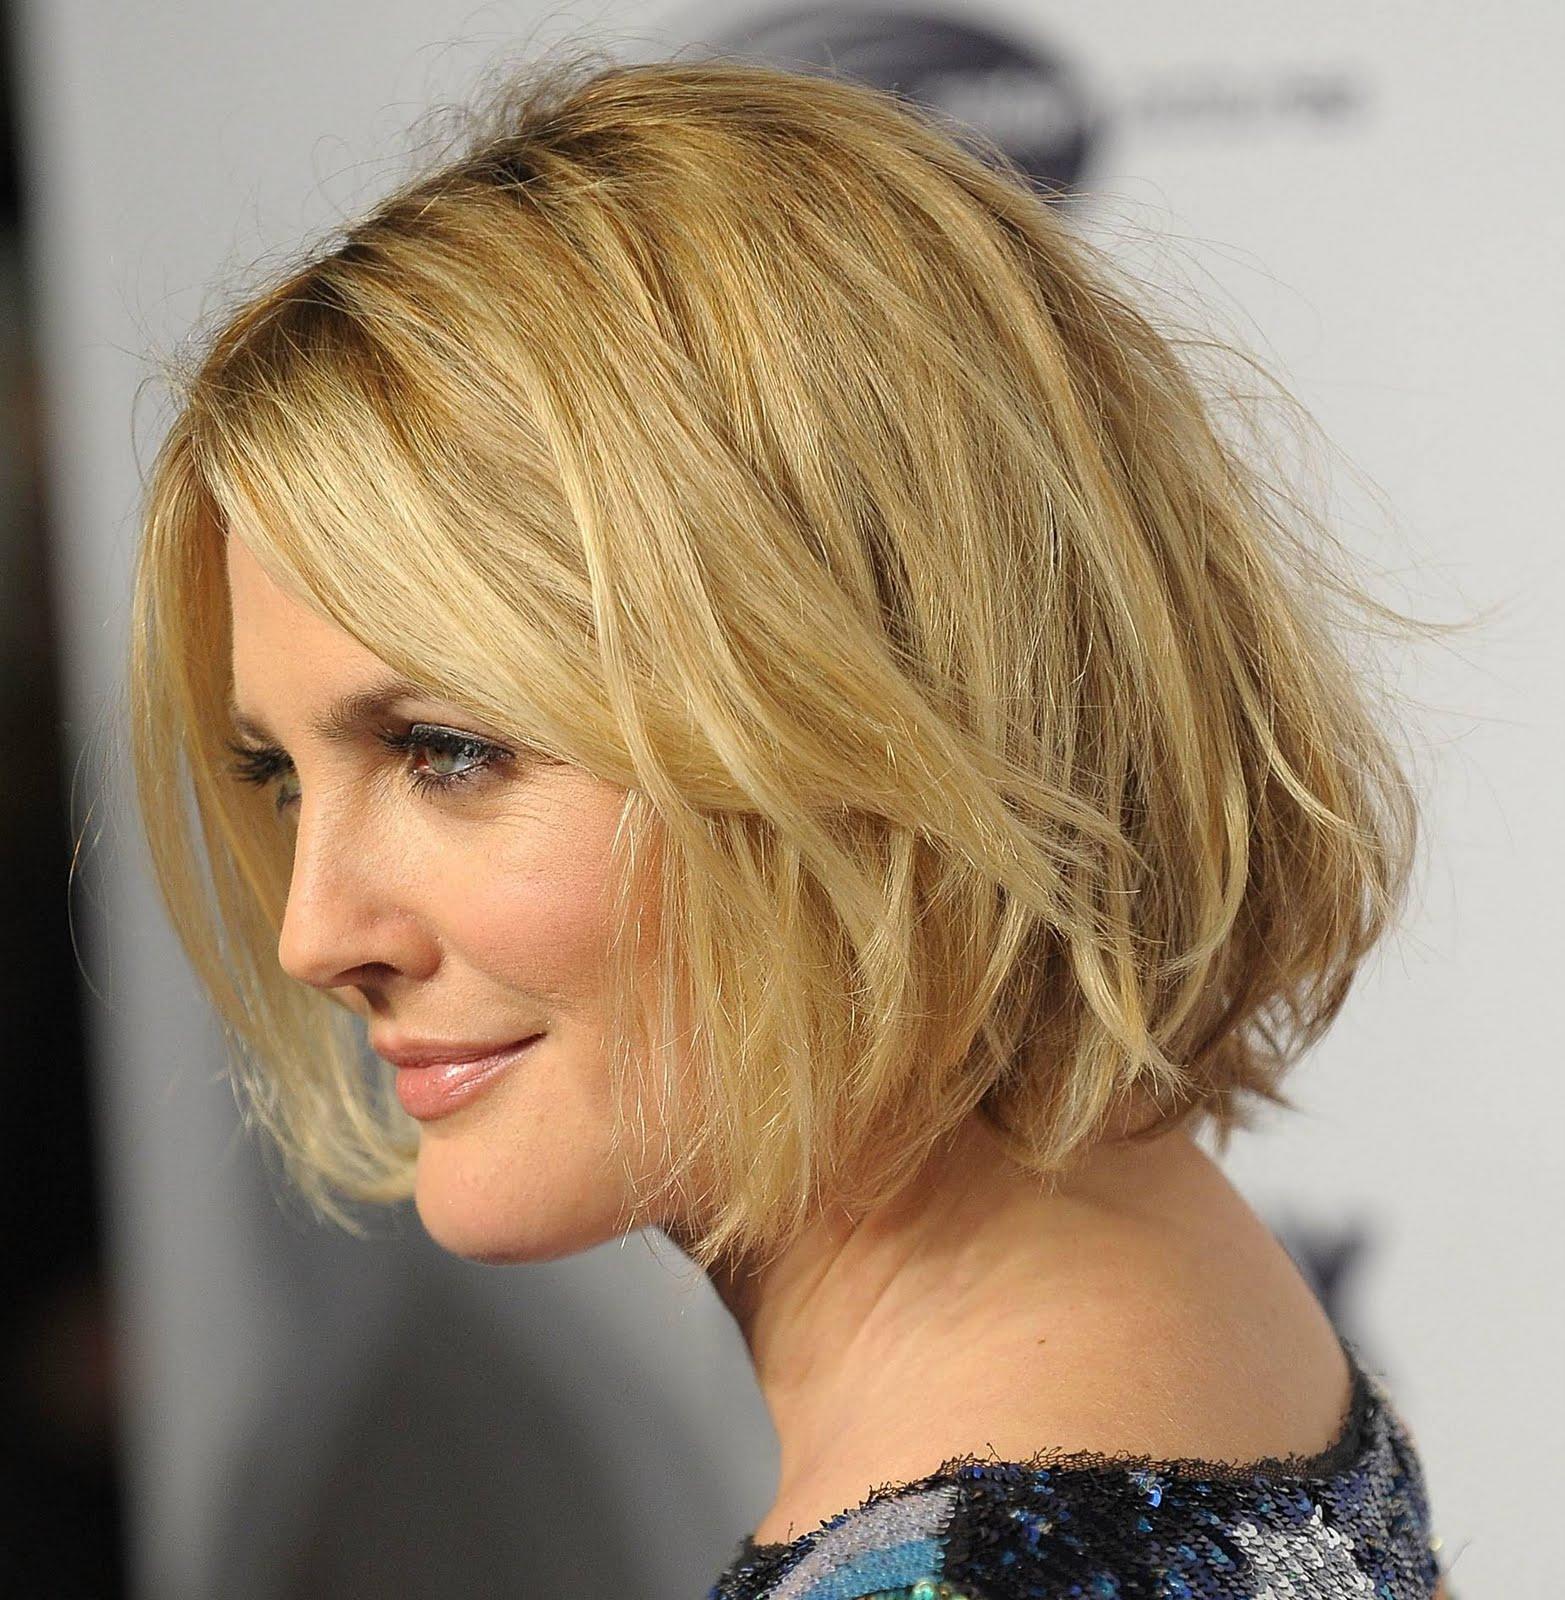 http://2.bp.blogspot.com/-OOH0Q7dpxeE/TdCN4_Nh_kI/AAAAAAAAA50/JU8M8awwdtA/s1600/drew-barrymore-bob-hairstyle.jpg